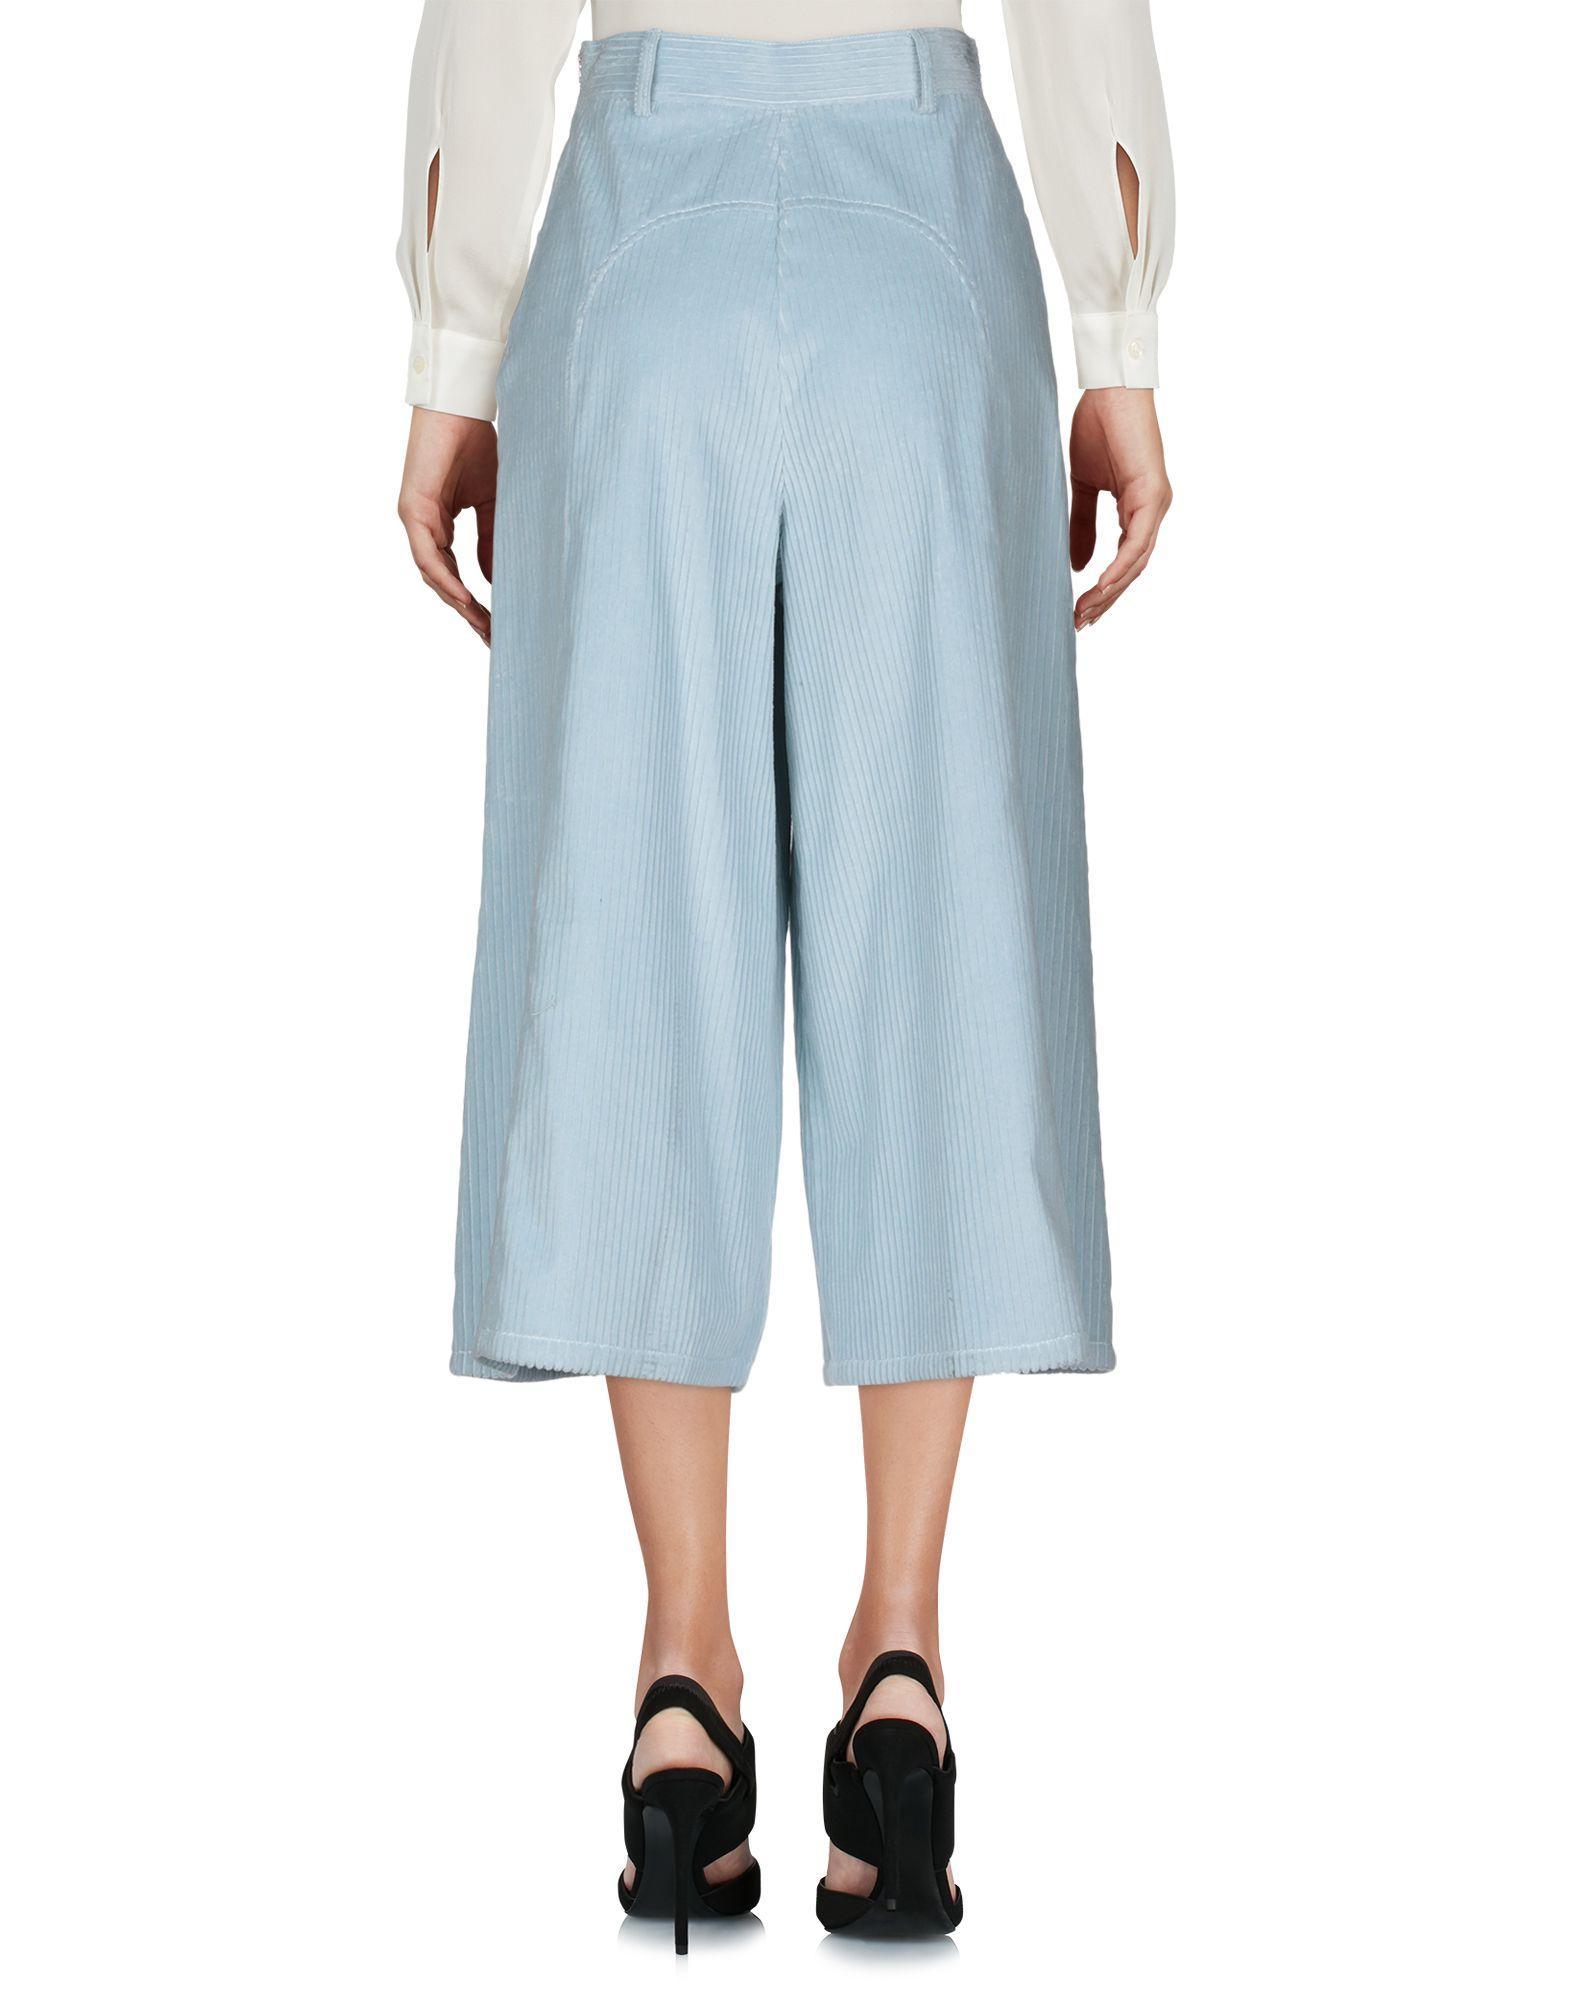 Pantalones piratas See By Chloé de Terciopelo de color Azul